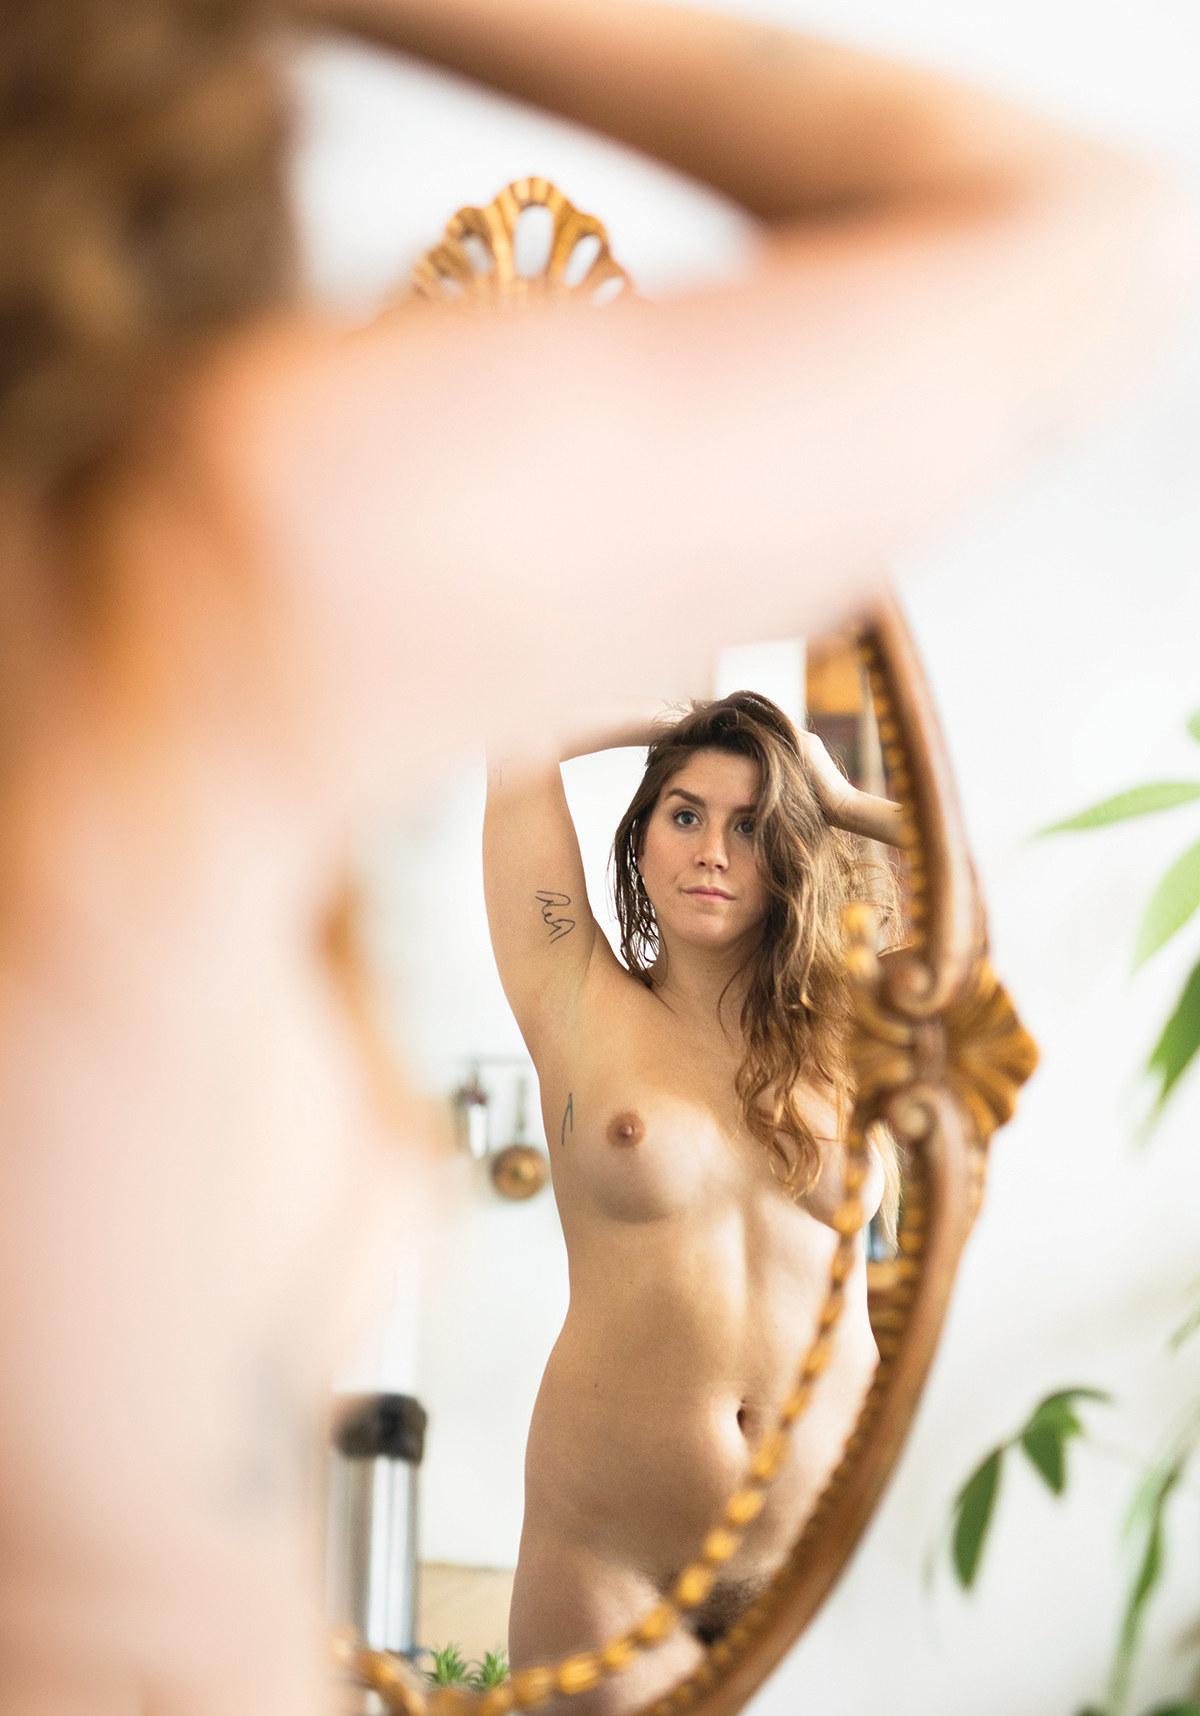 saggers tits